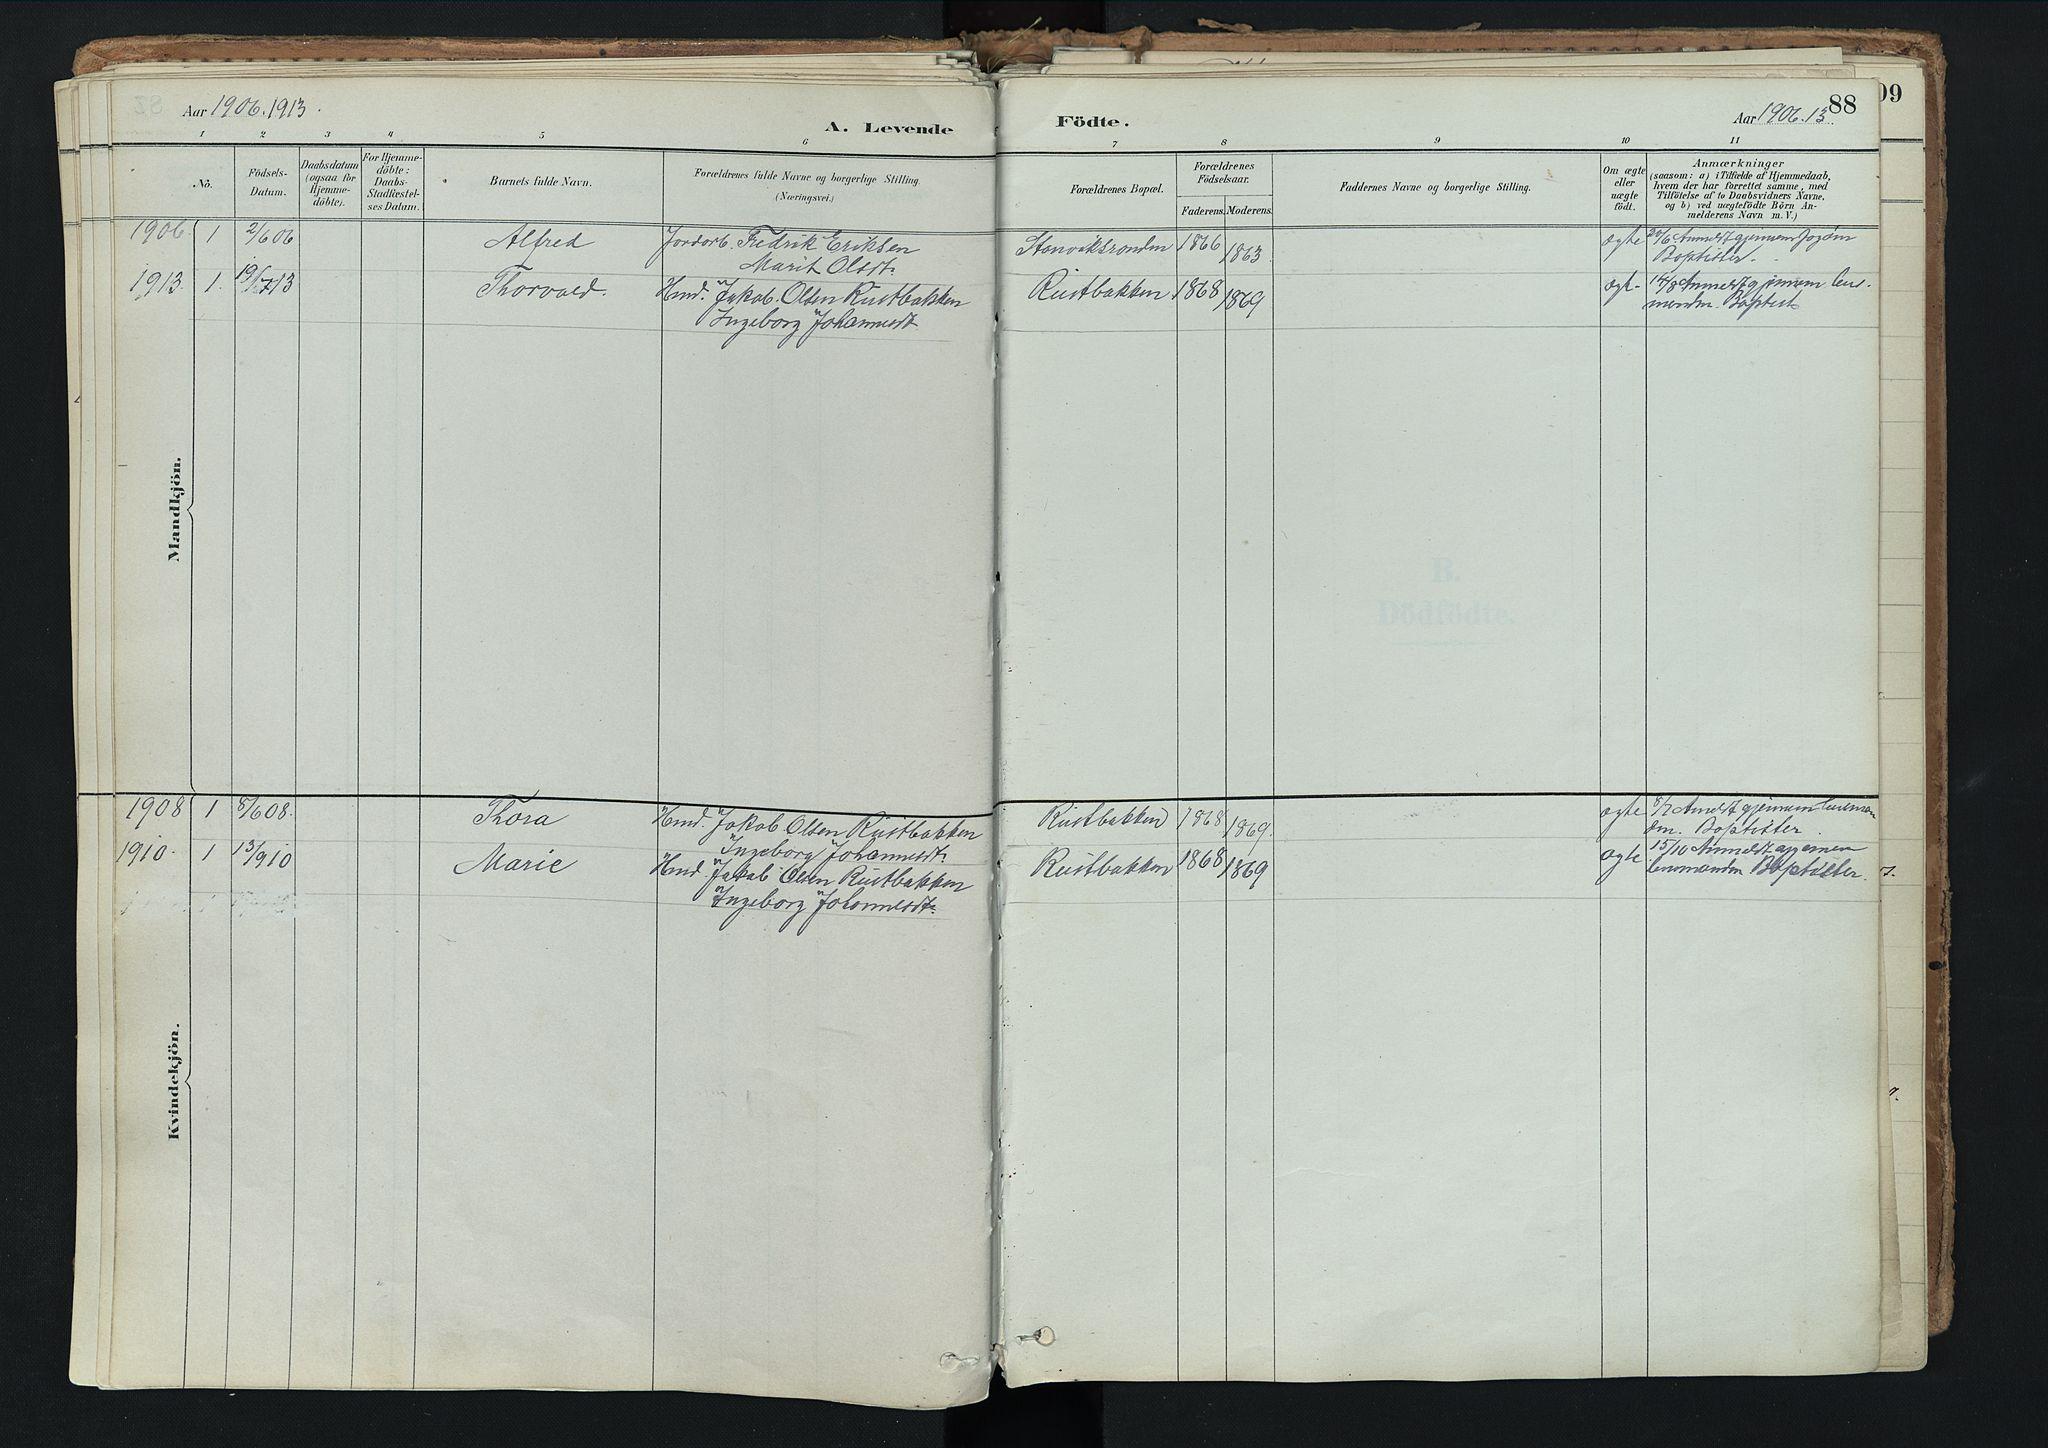 SAH, Nord-Fron prestekontor, Ministerialbok nr. 3, 1884-1914, s. 88